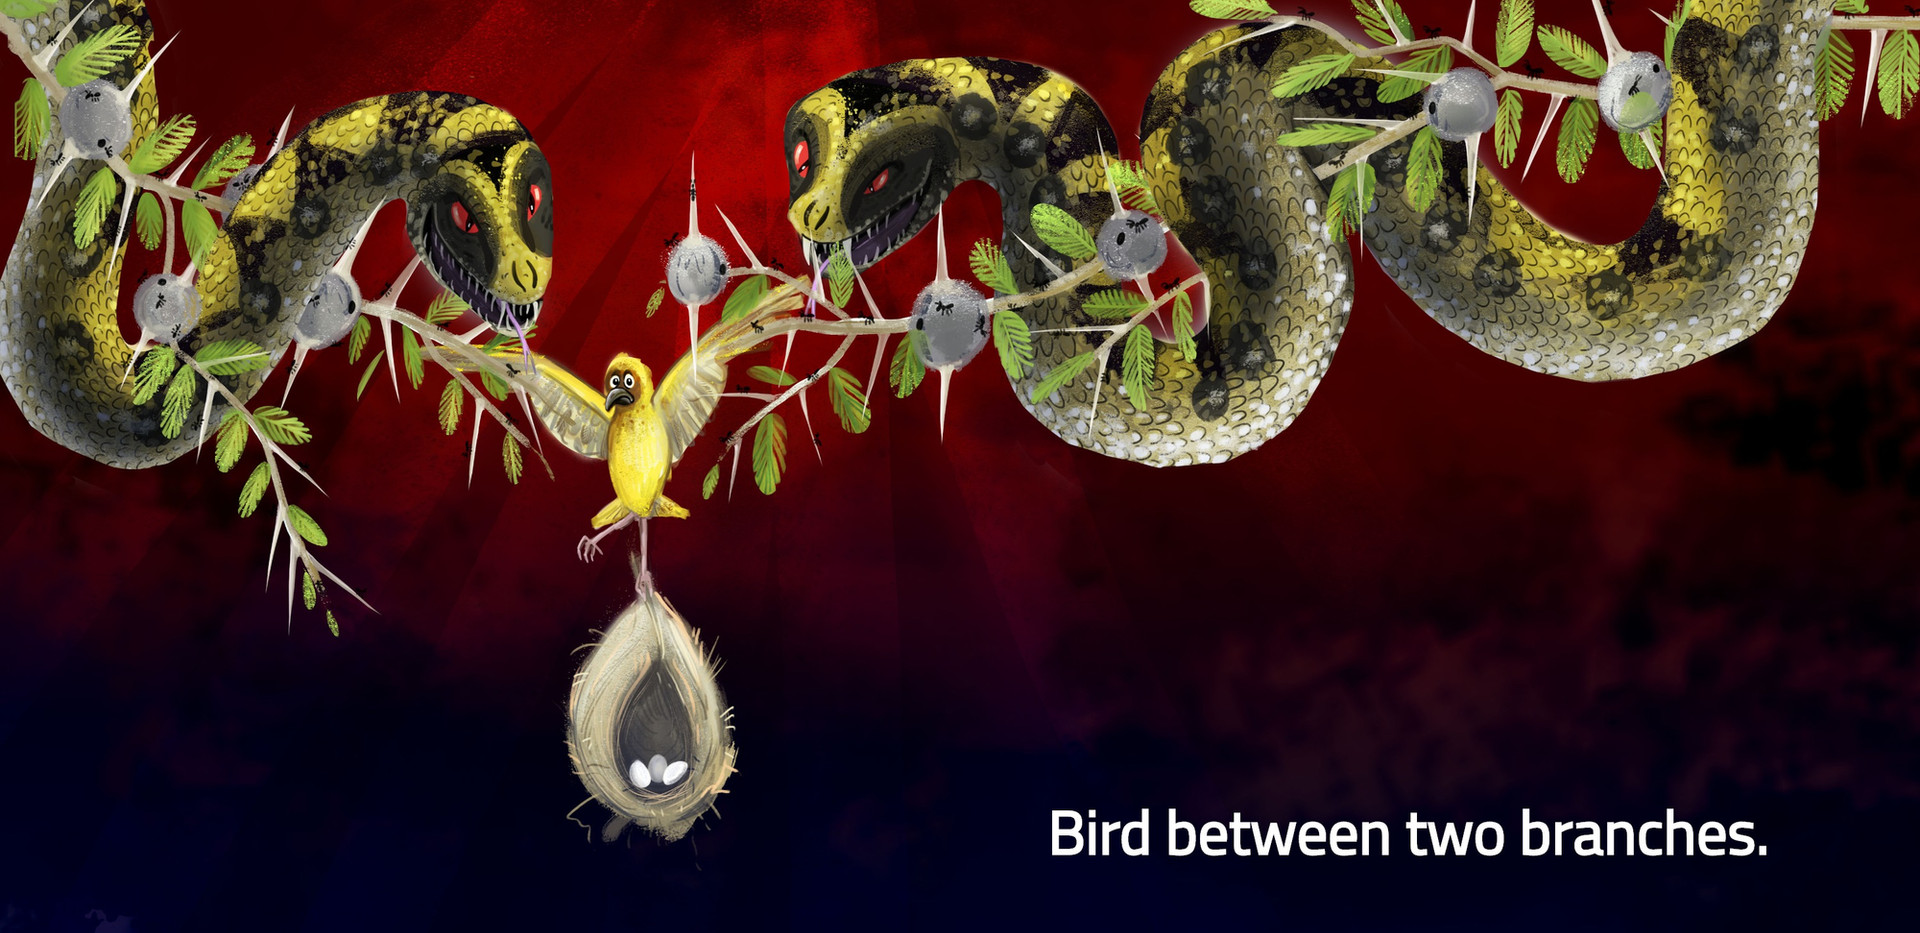 Bird between two branches